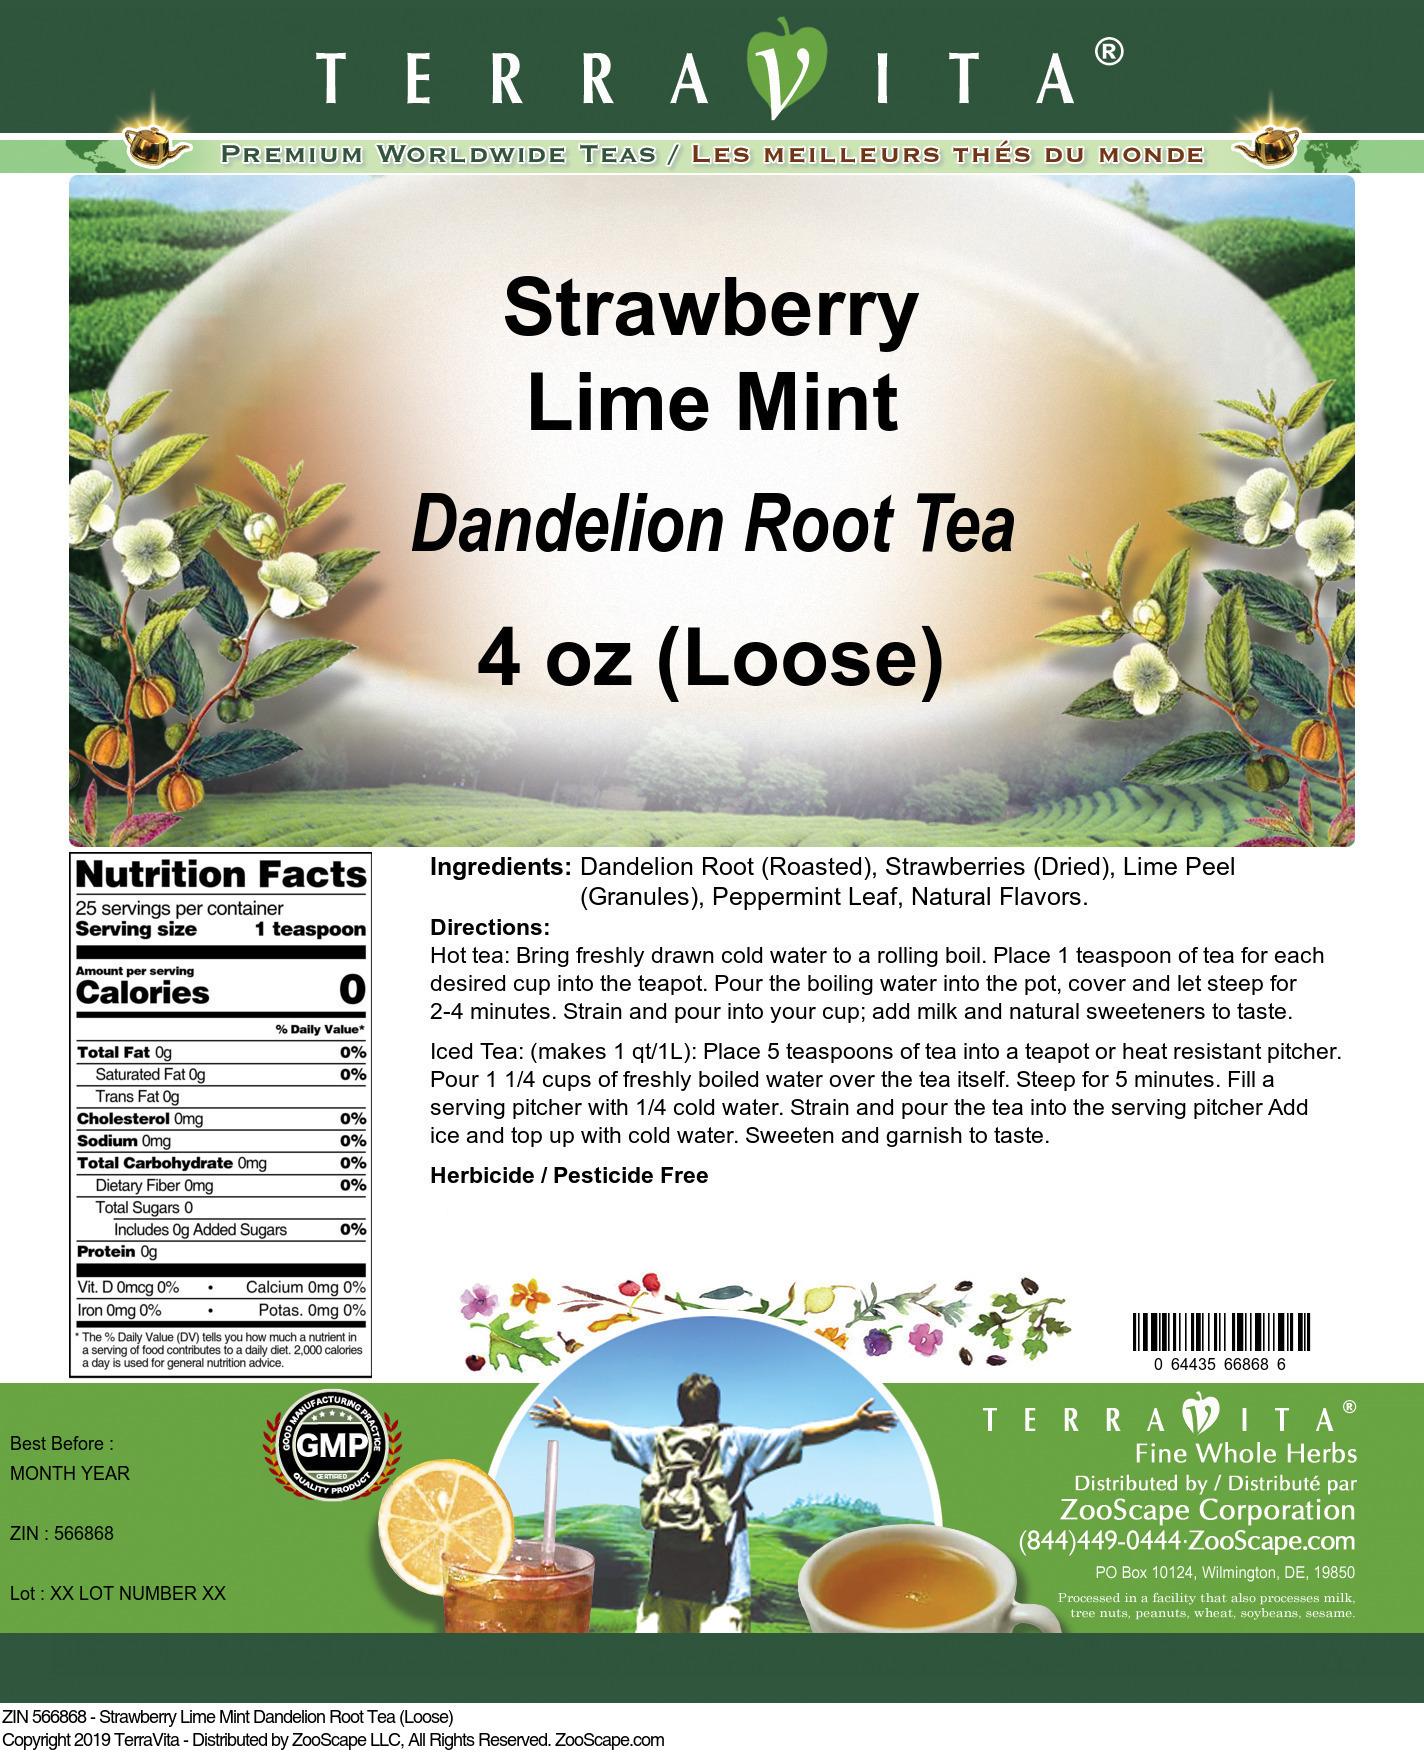 Strawberry Lime Mint Dandelion Root Tea (Loose)